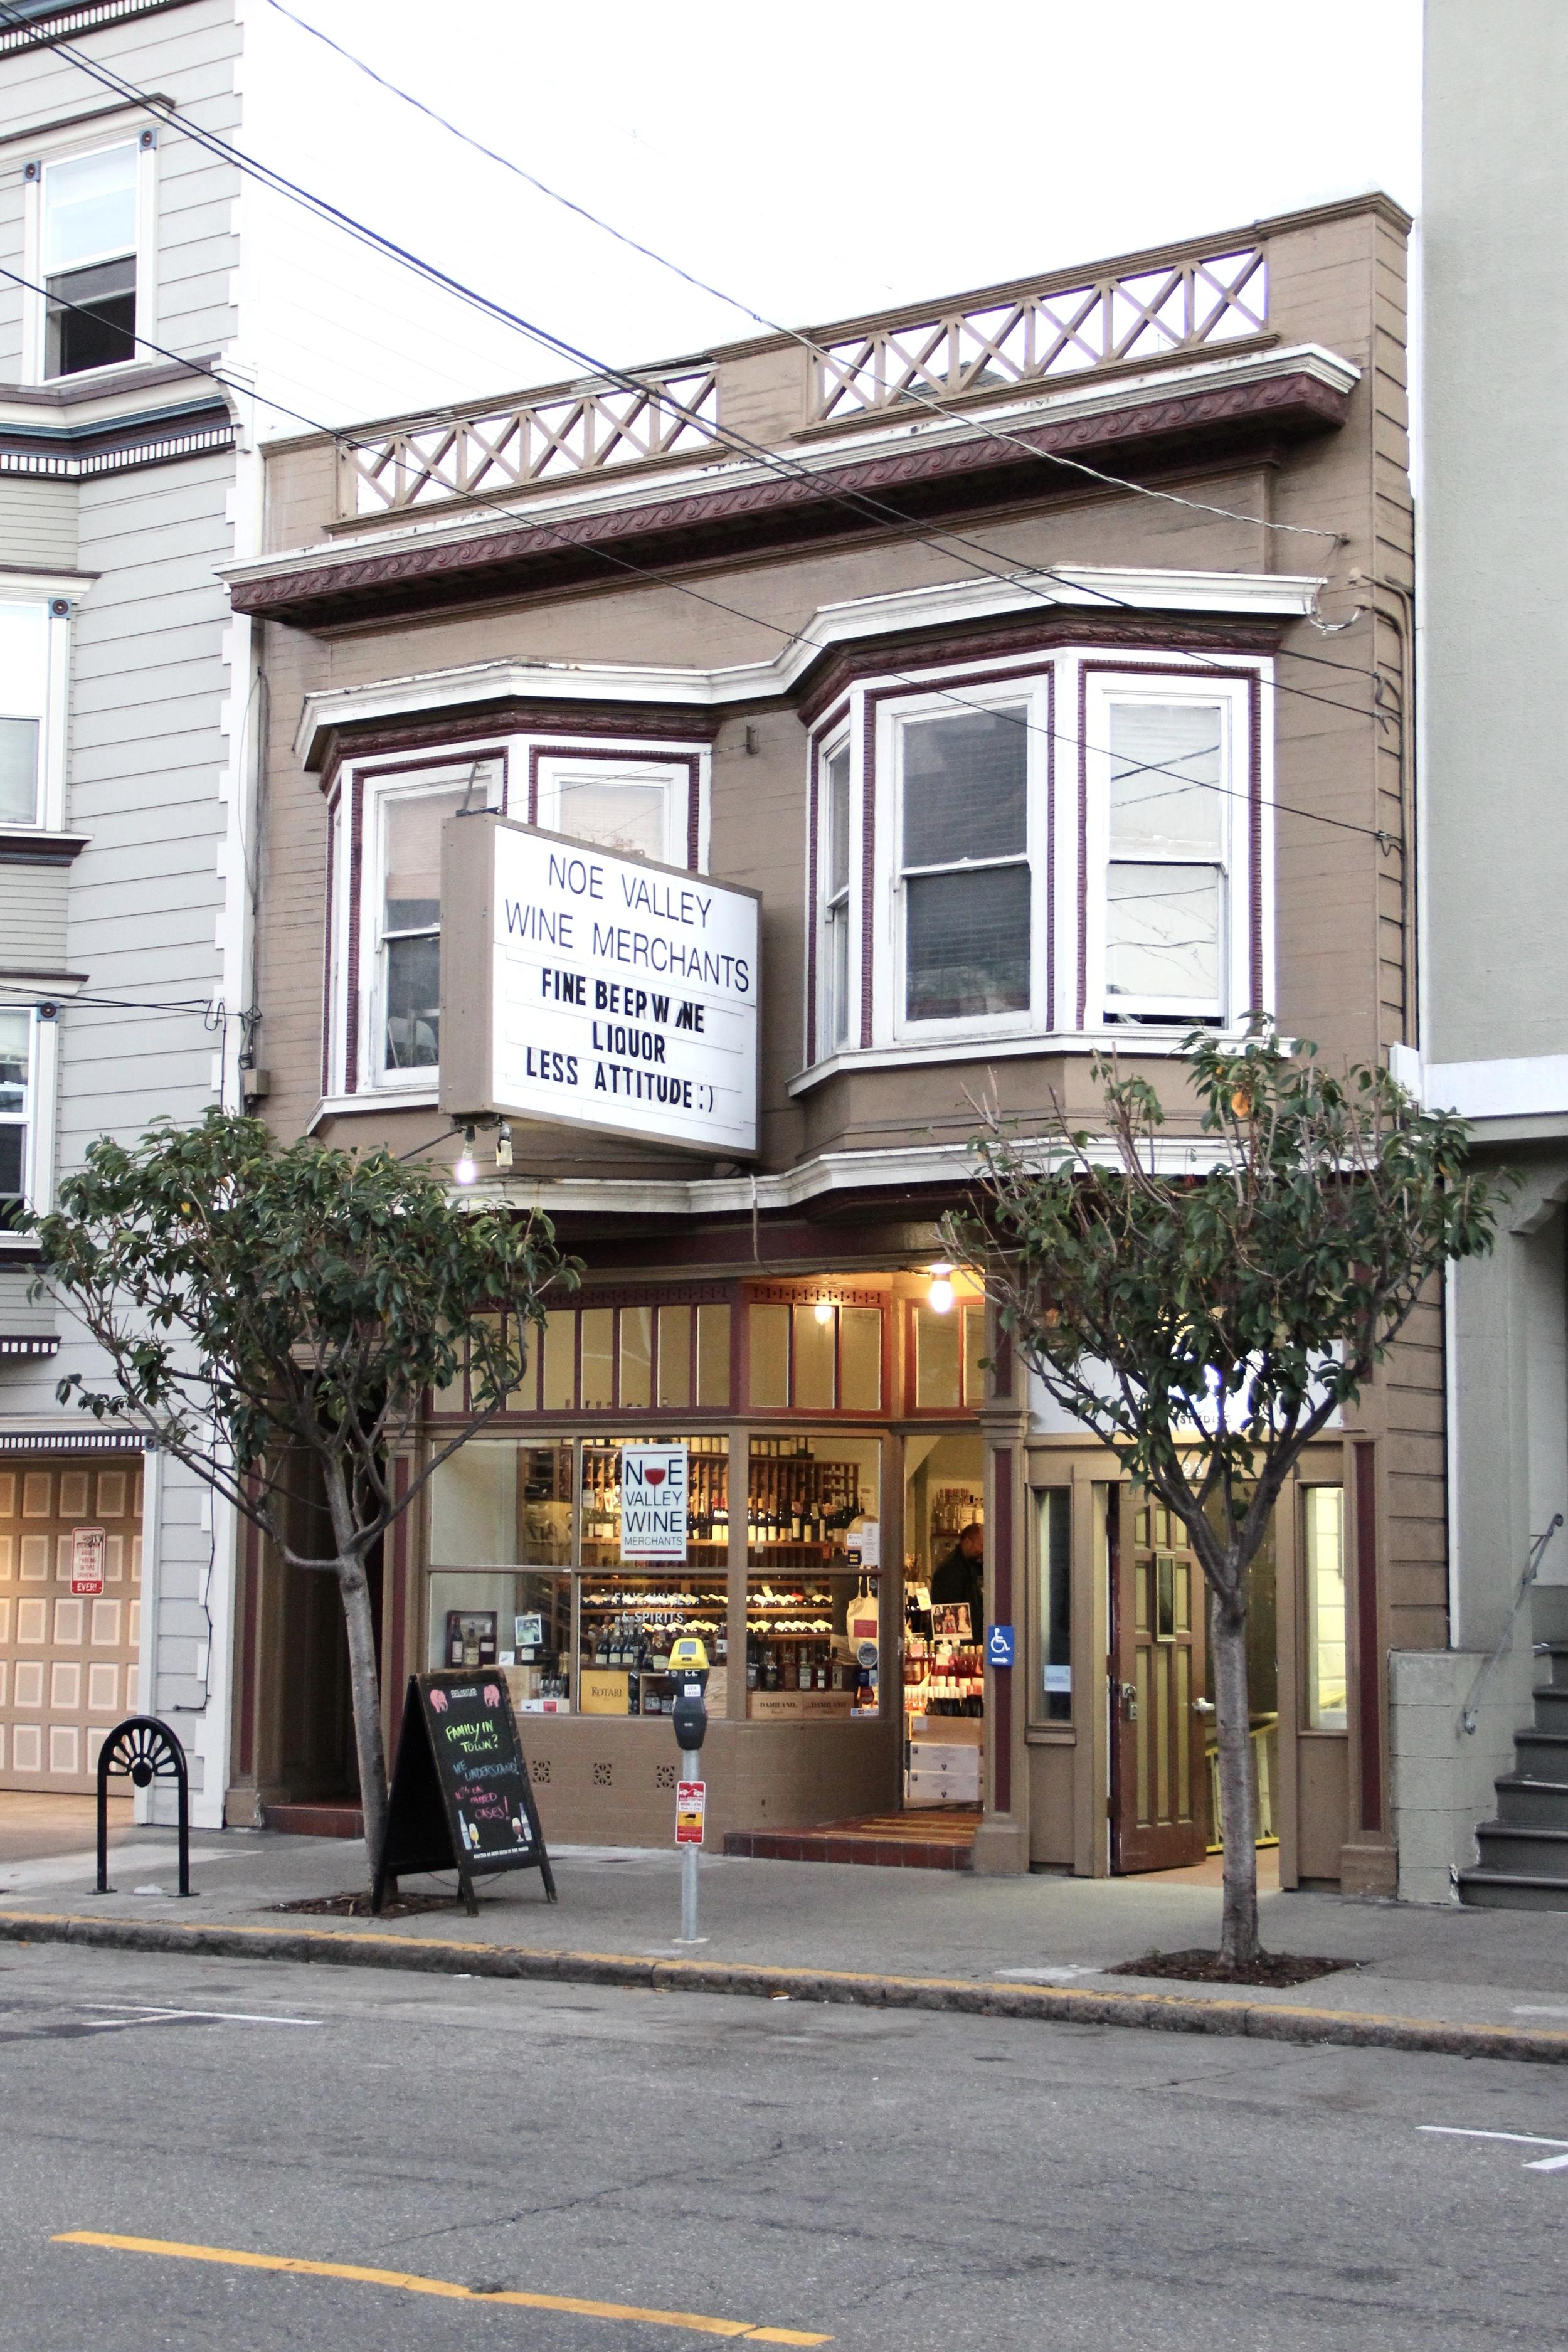 """Fine Beer Wine Liquor, Less Attitude :)"" Noe Valley, San Francisco | Beyond Ordinary Guides"